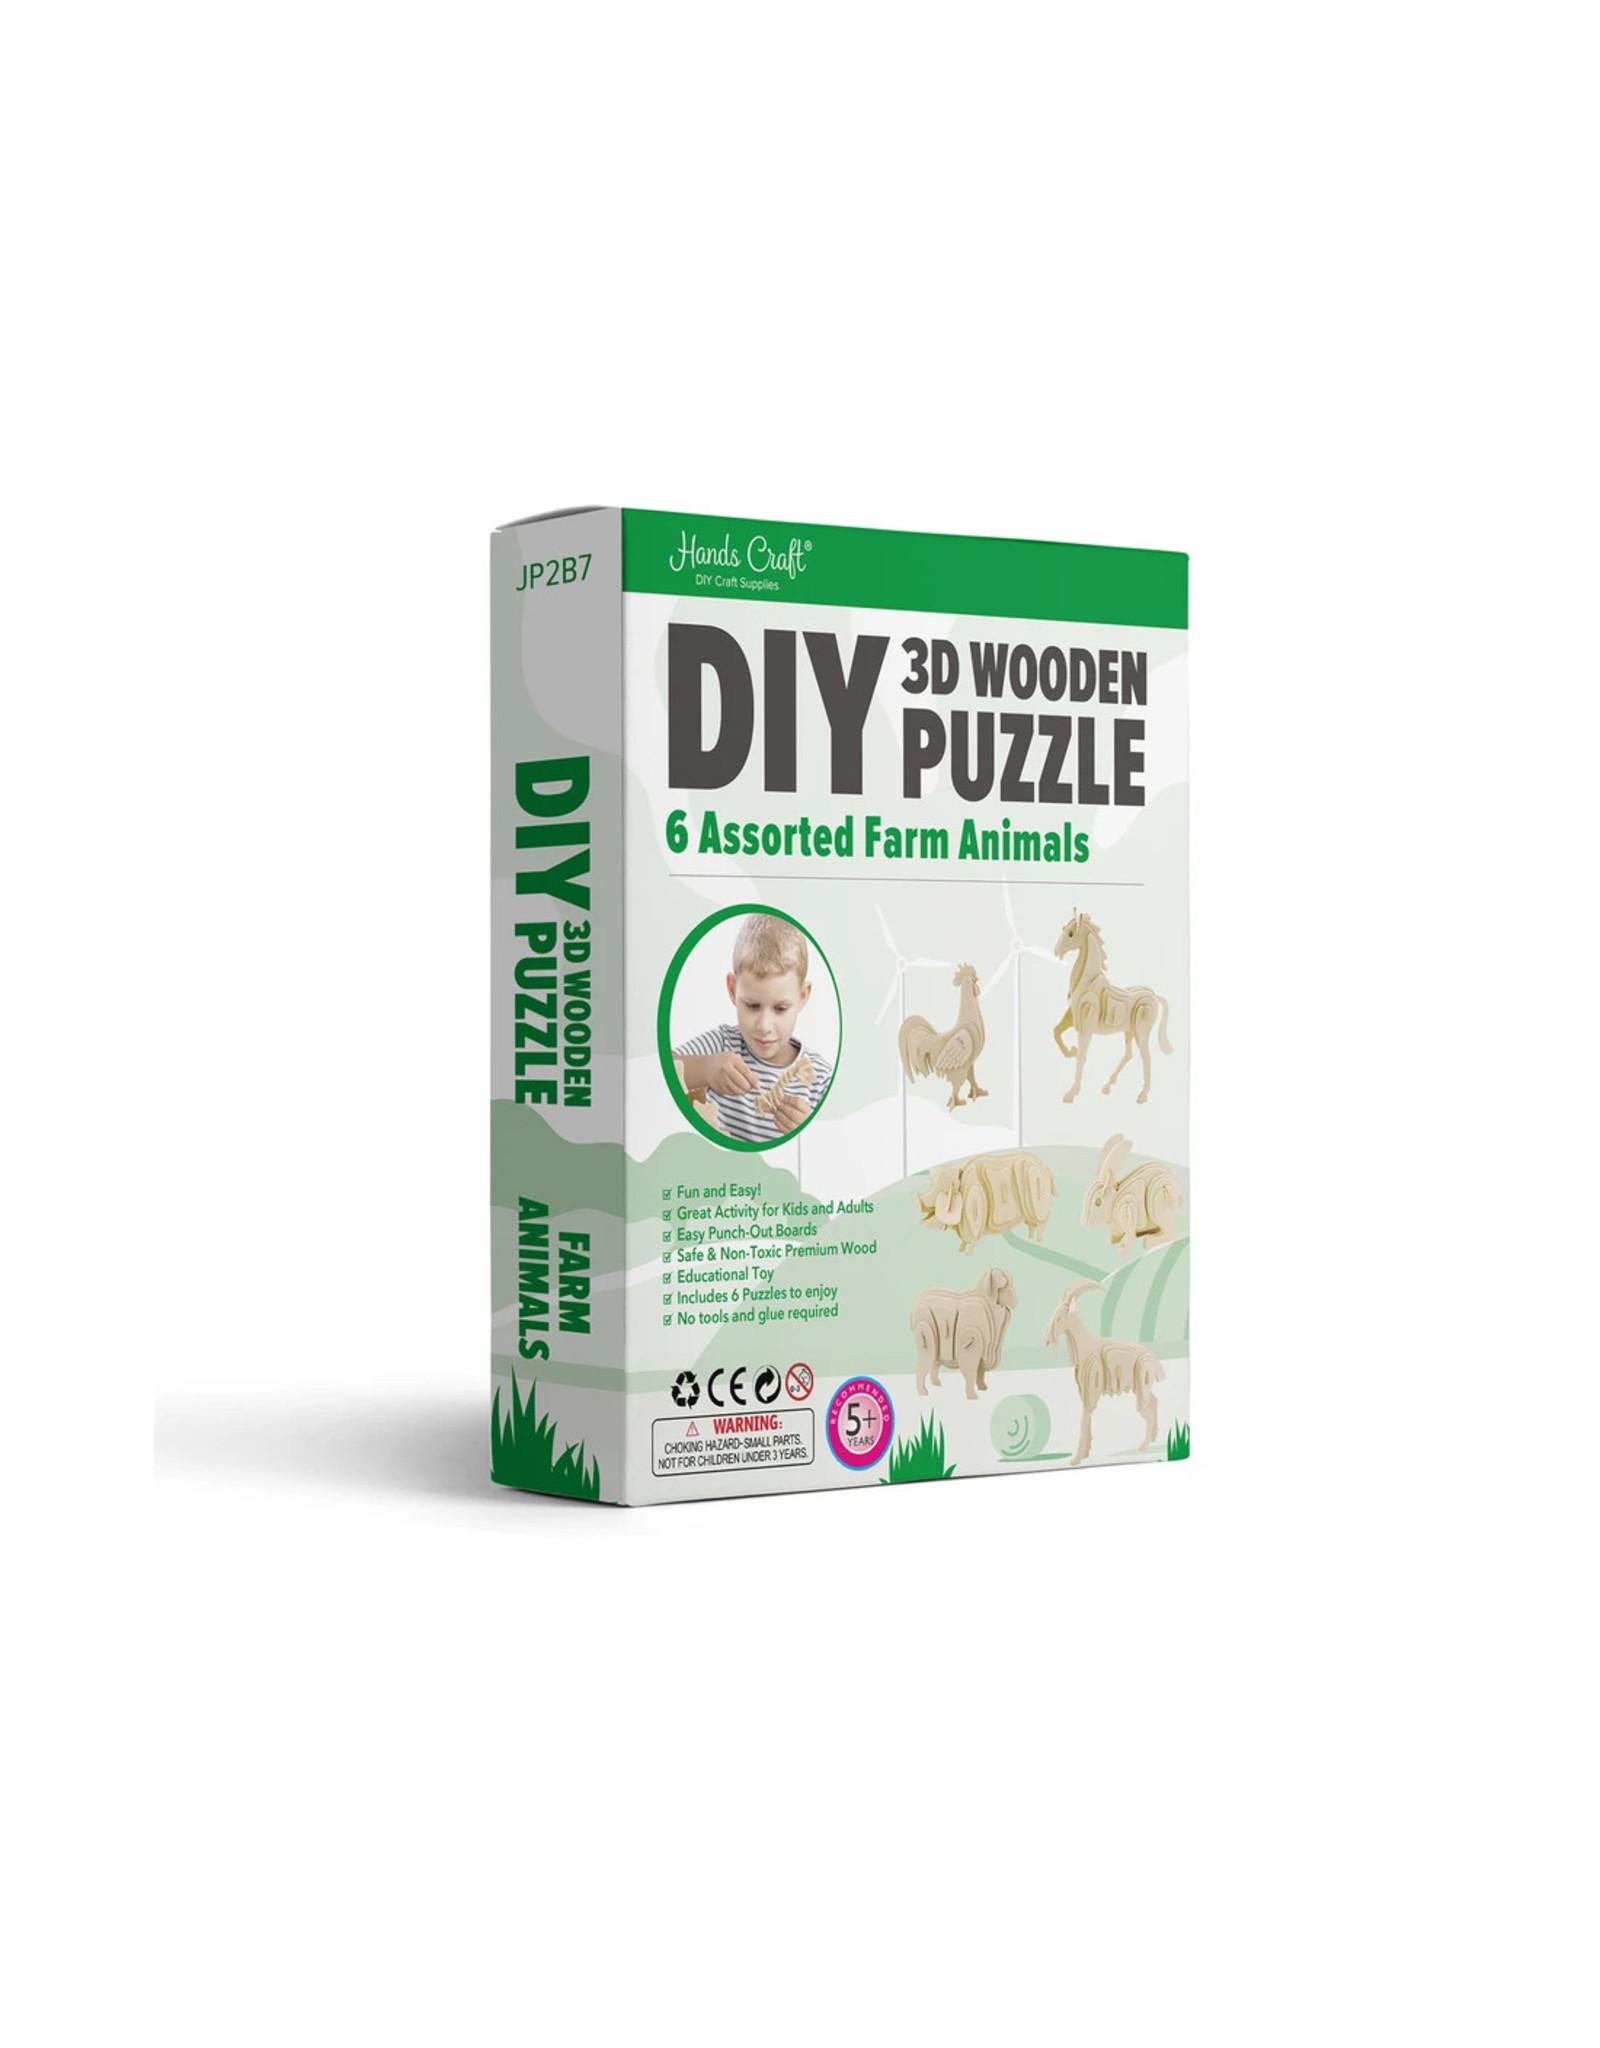 Hands Craft 3D Wooden Puzzle 6ct - Farm